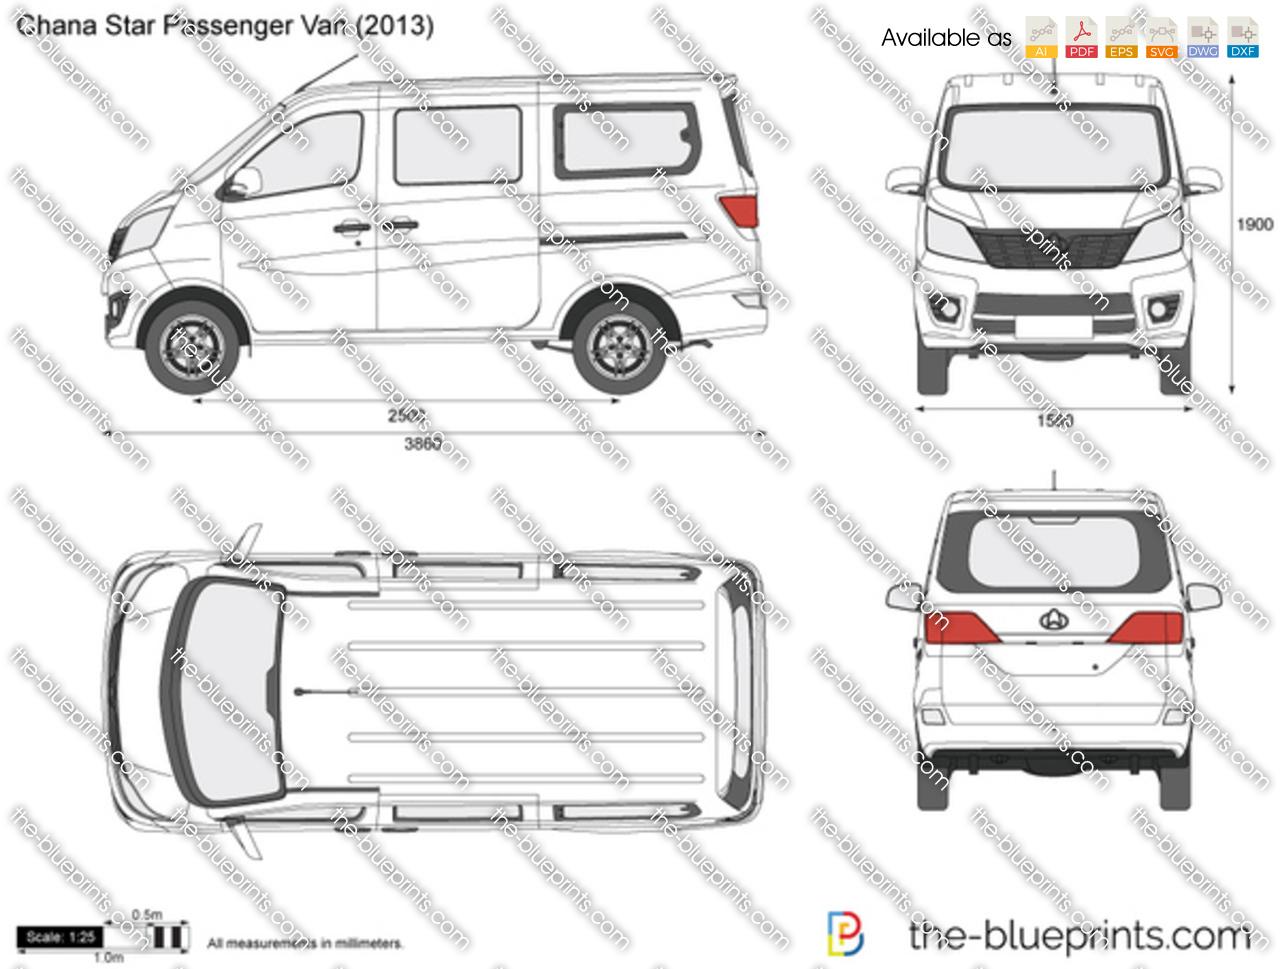 Chana Star Passenger Van